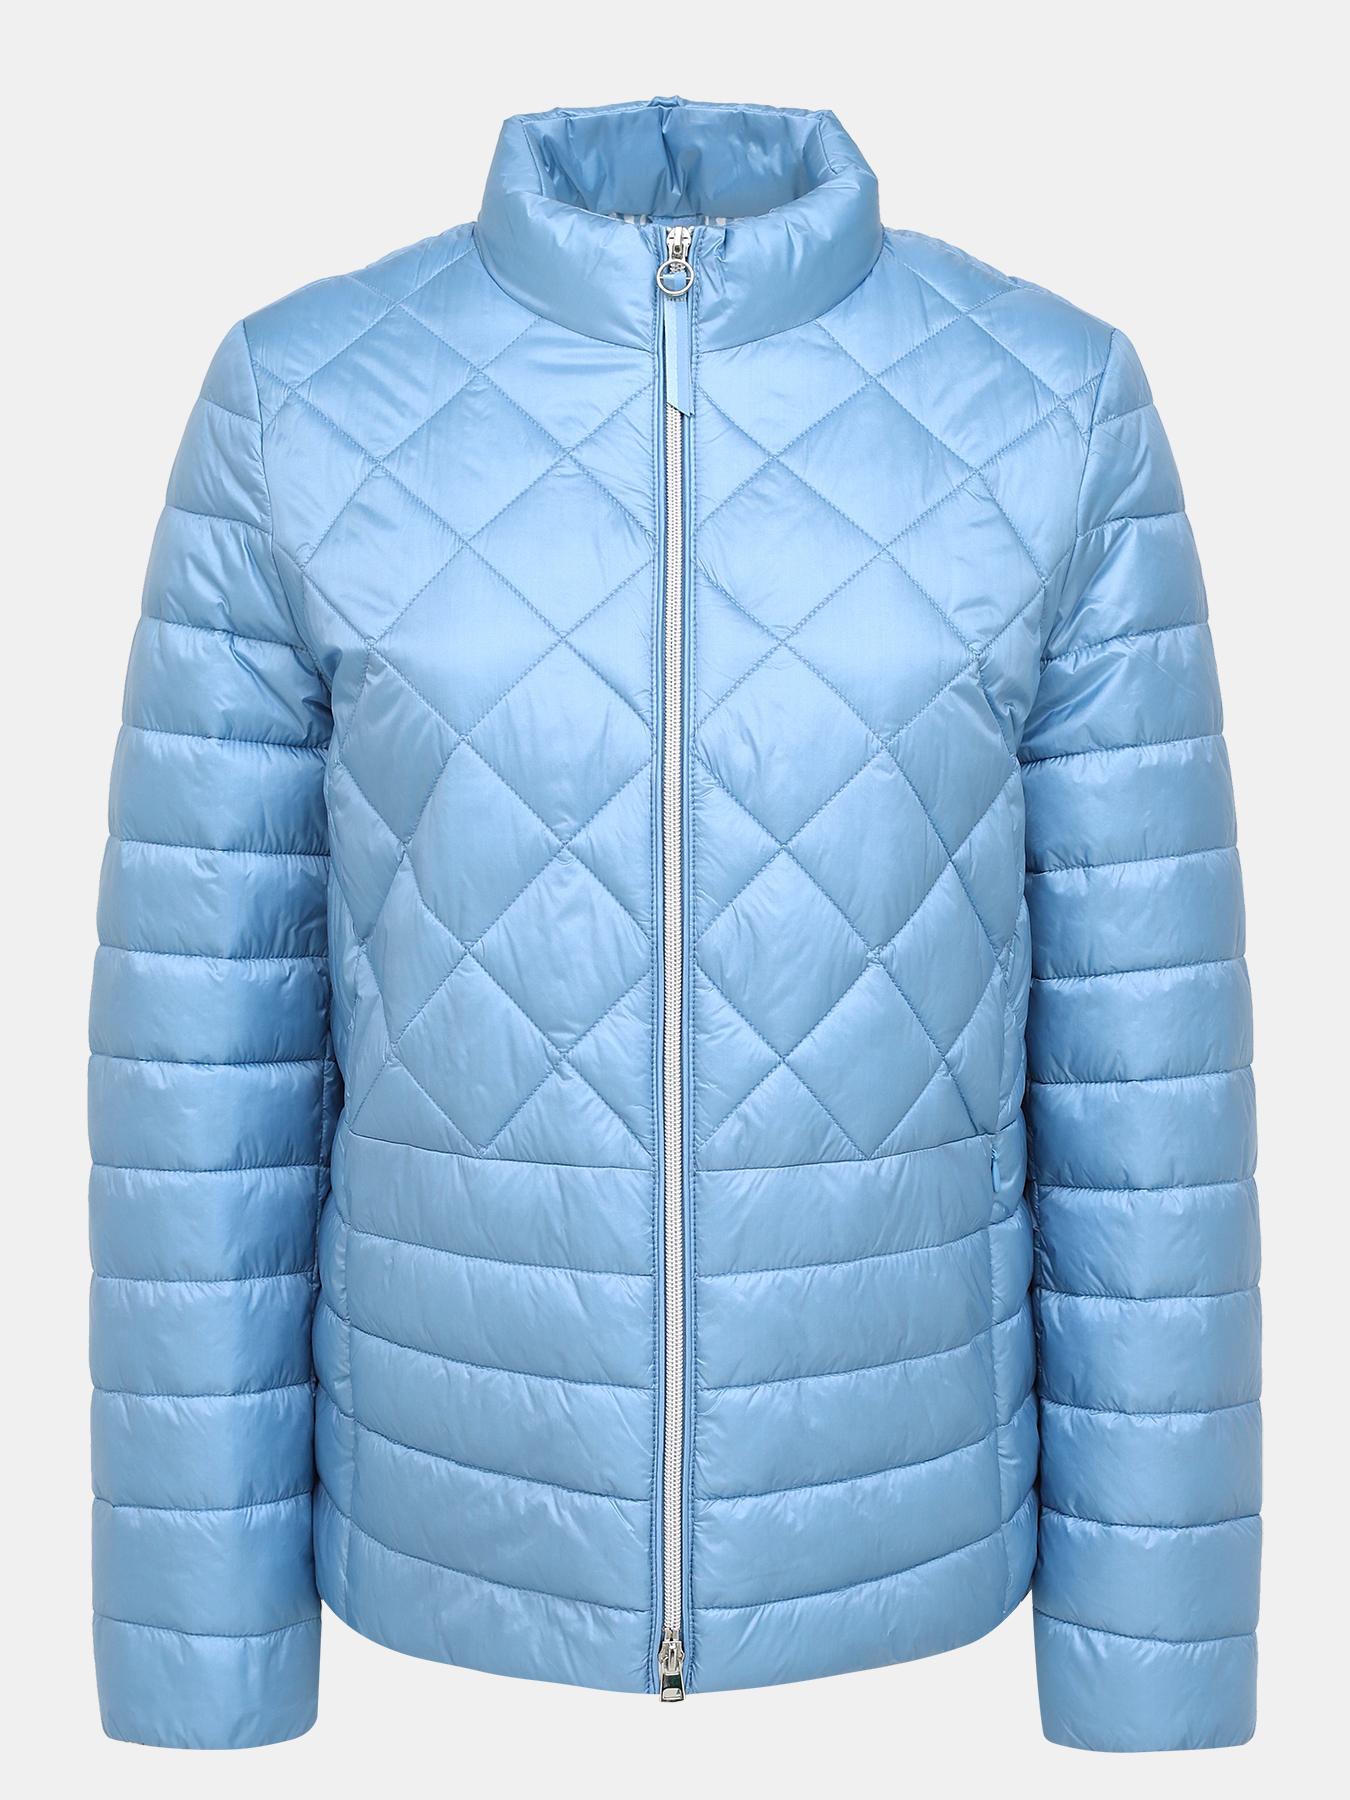 Фото - Куртки Gerry Weber Куртка куртка утепленная jorg weber jorg weber mp002xm0yi6y